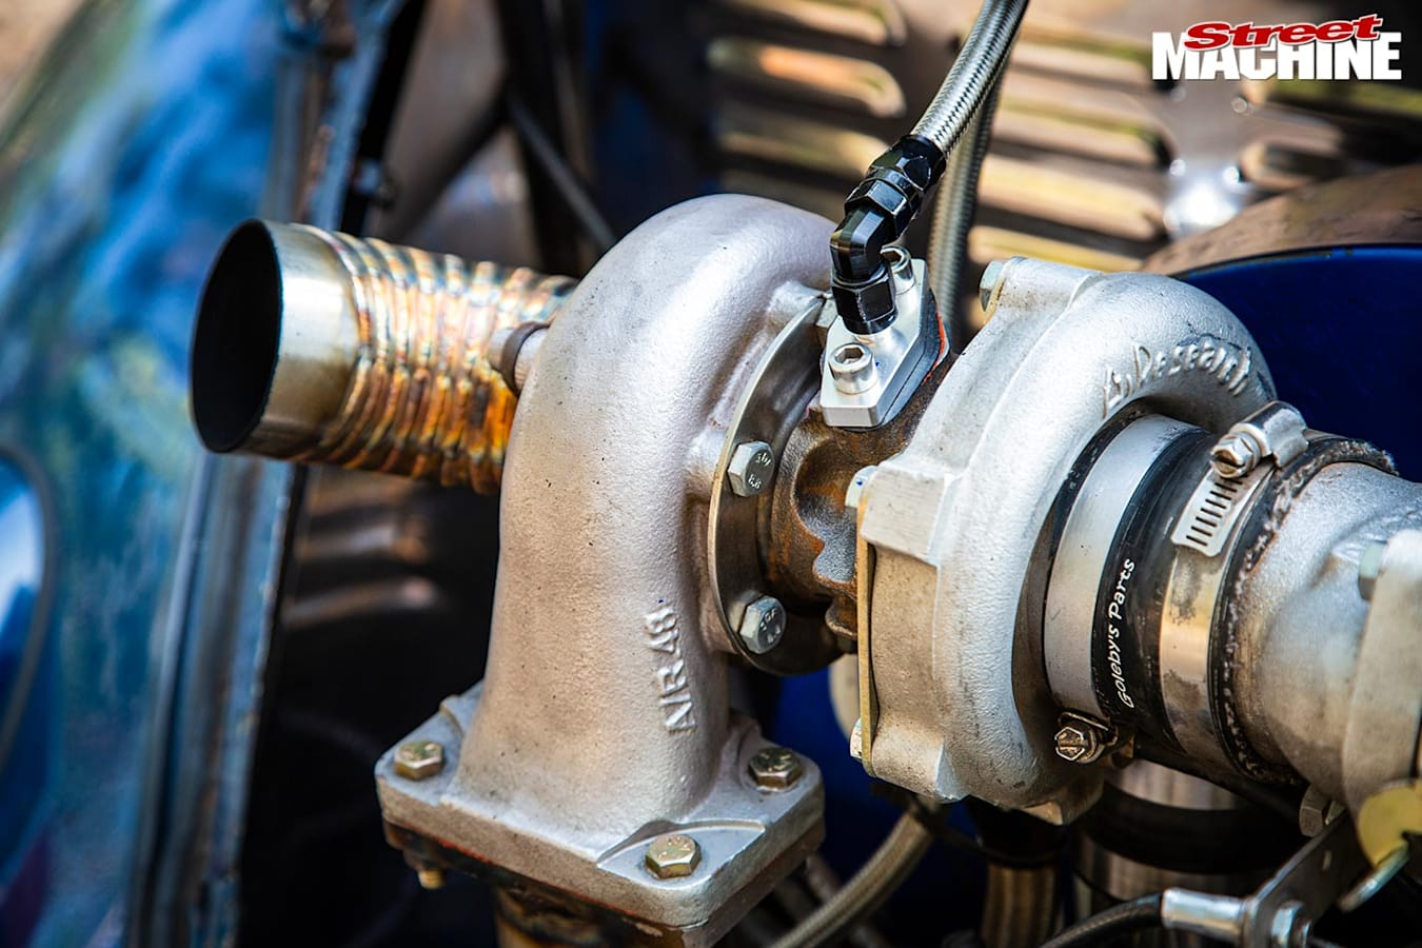 VW Beelte engine